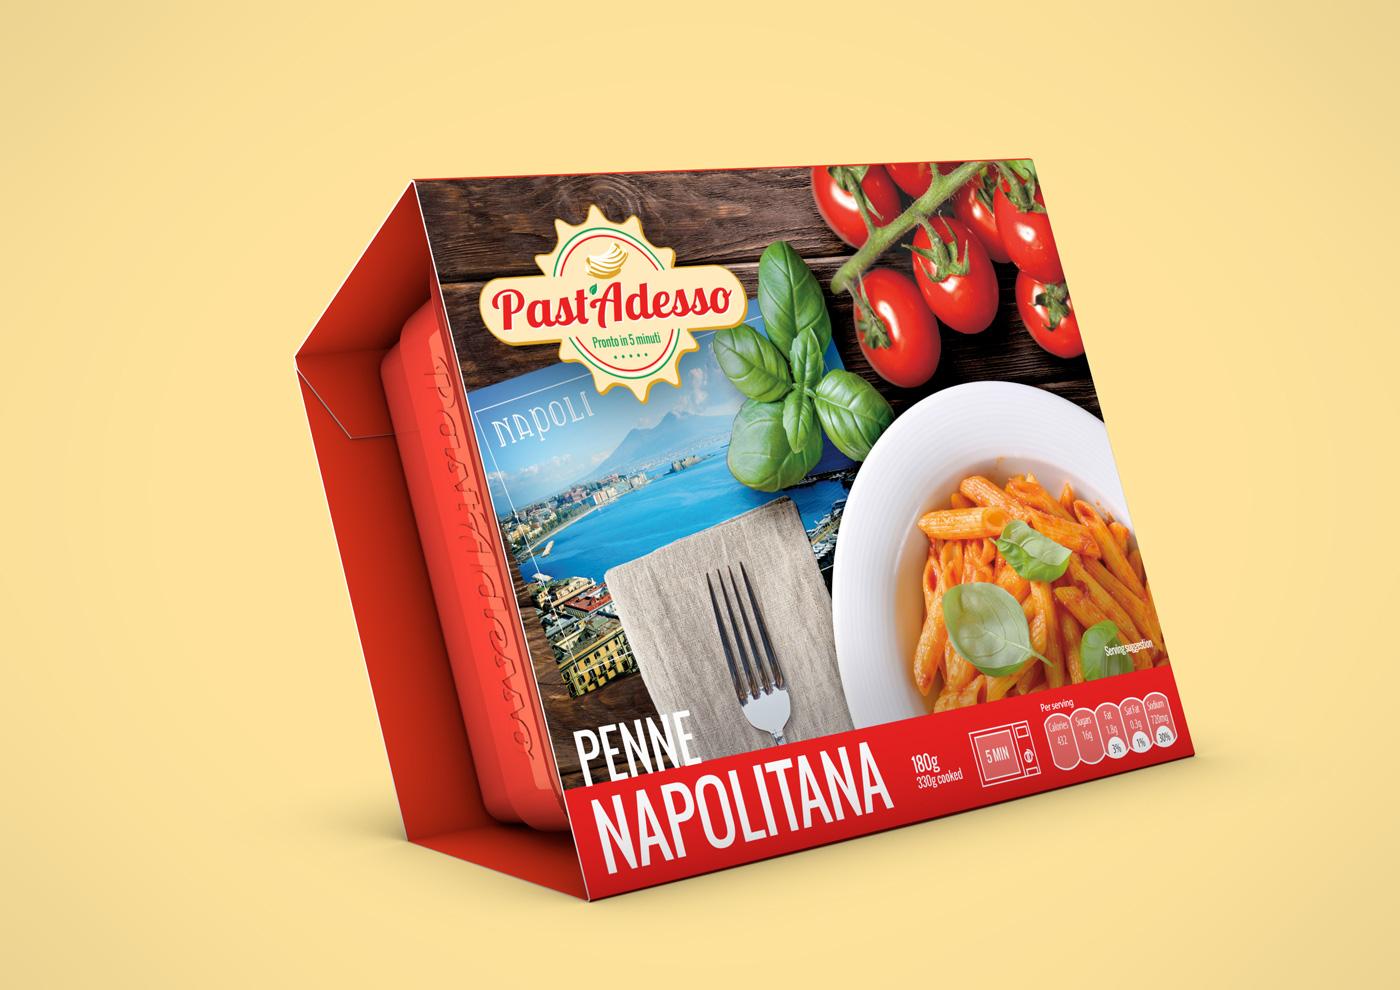 PastAdesso Penne Napolitana